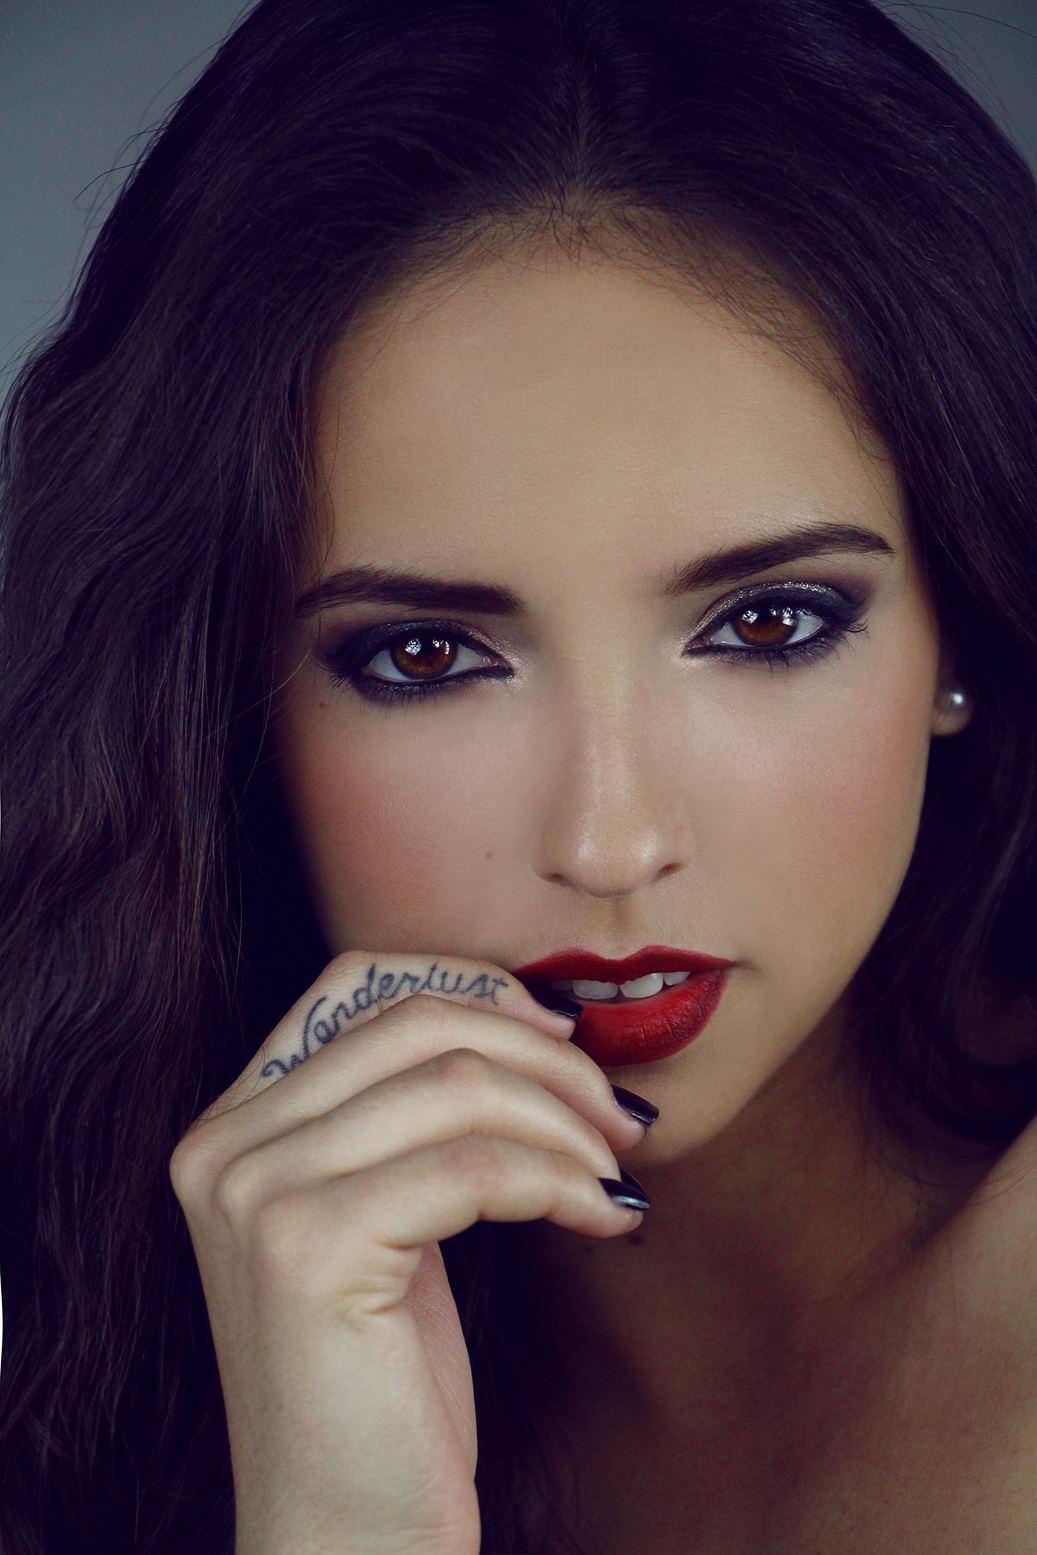 – 1 d Beauty Katherine Eastman Mairelys make up artist beauty portrait photography Miami south florida beauty sunamys villalba style tattoo